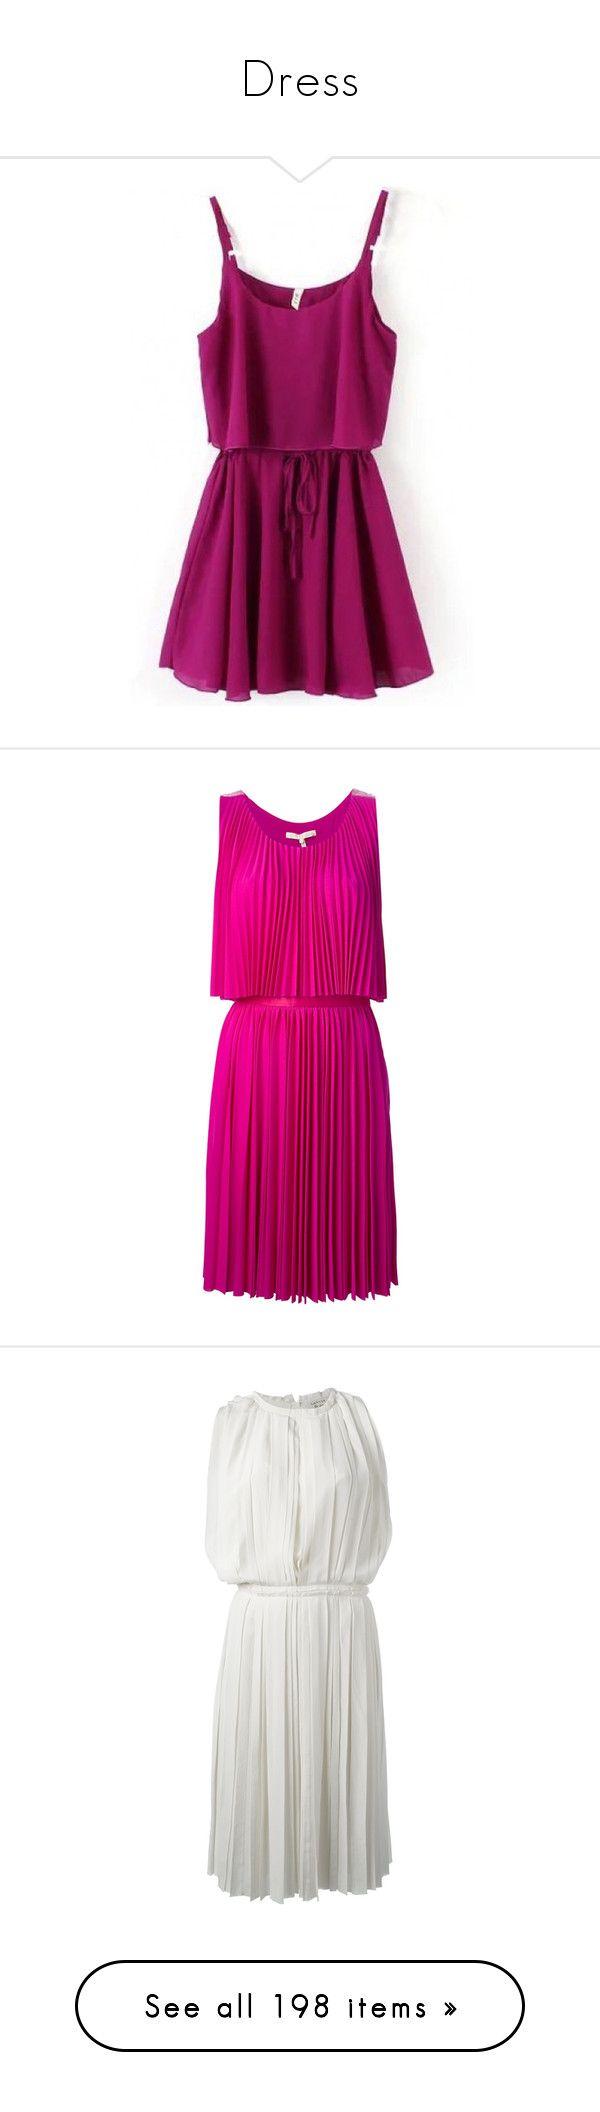 """Dress"" by alejaborrayo on Polyvore featuring dresses, vestidos, short dresses, purple mini dress, purple day dress, strap dress, skater dress, pink, halston heritage dress y sleeveless short dress"